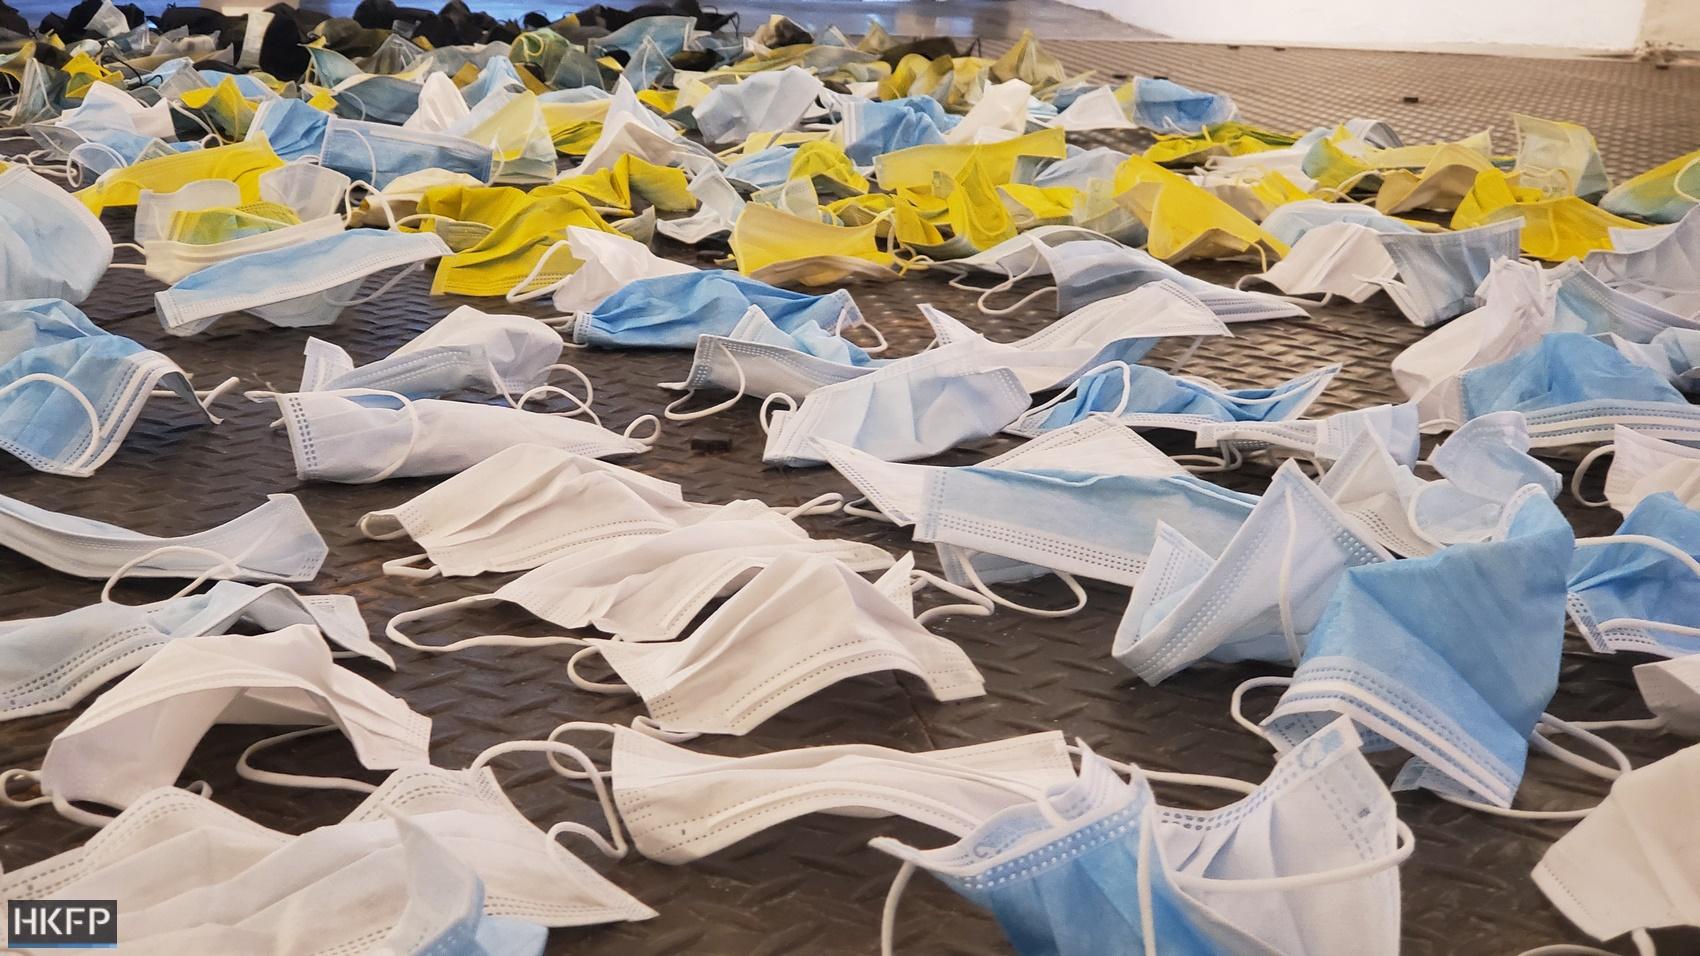 masks covid19 covid coronavirus medical waste ppe